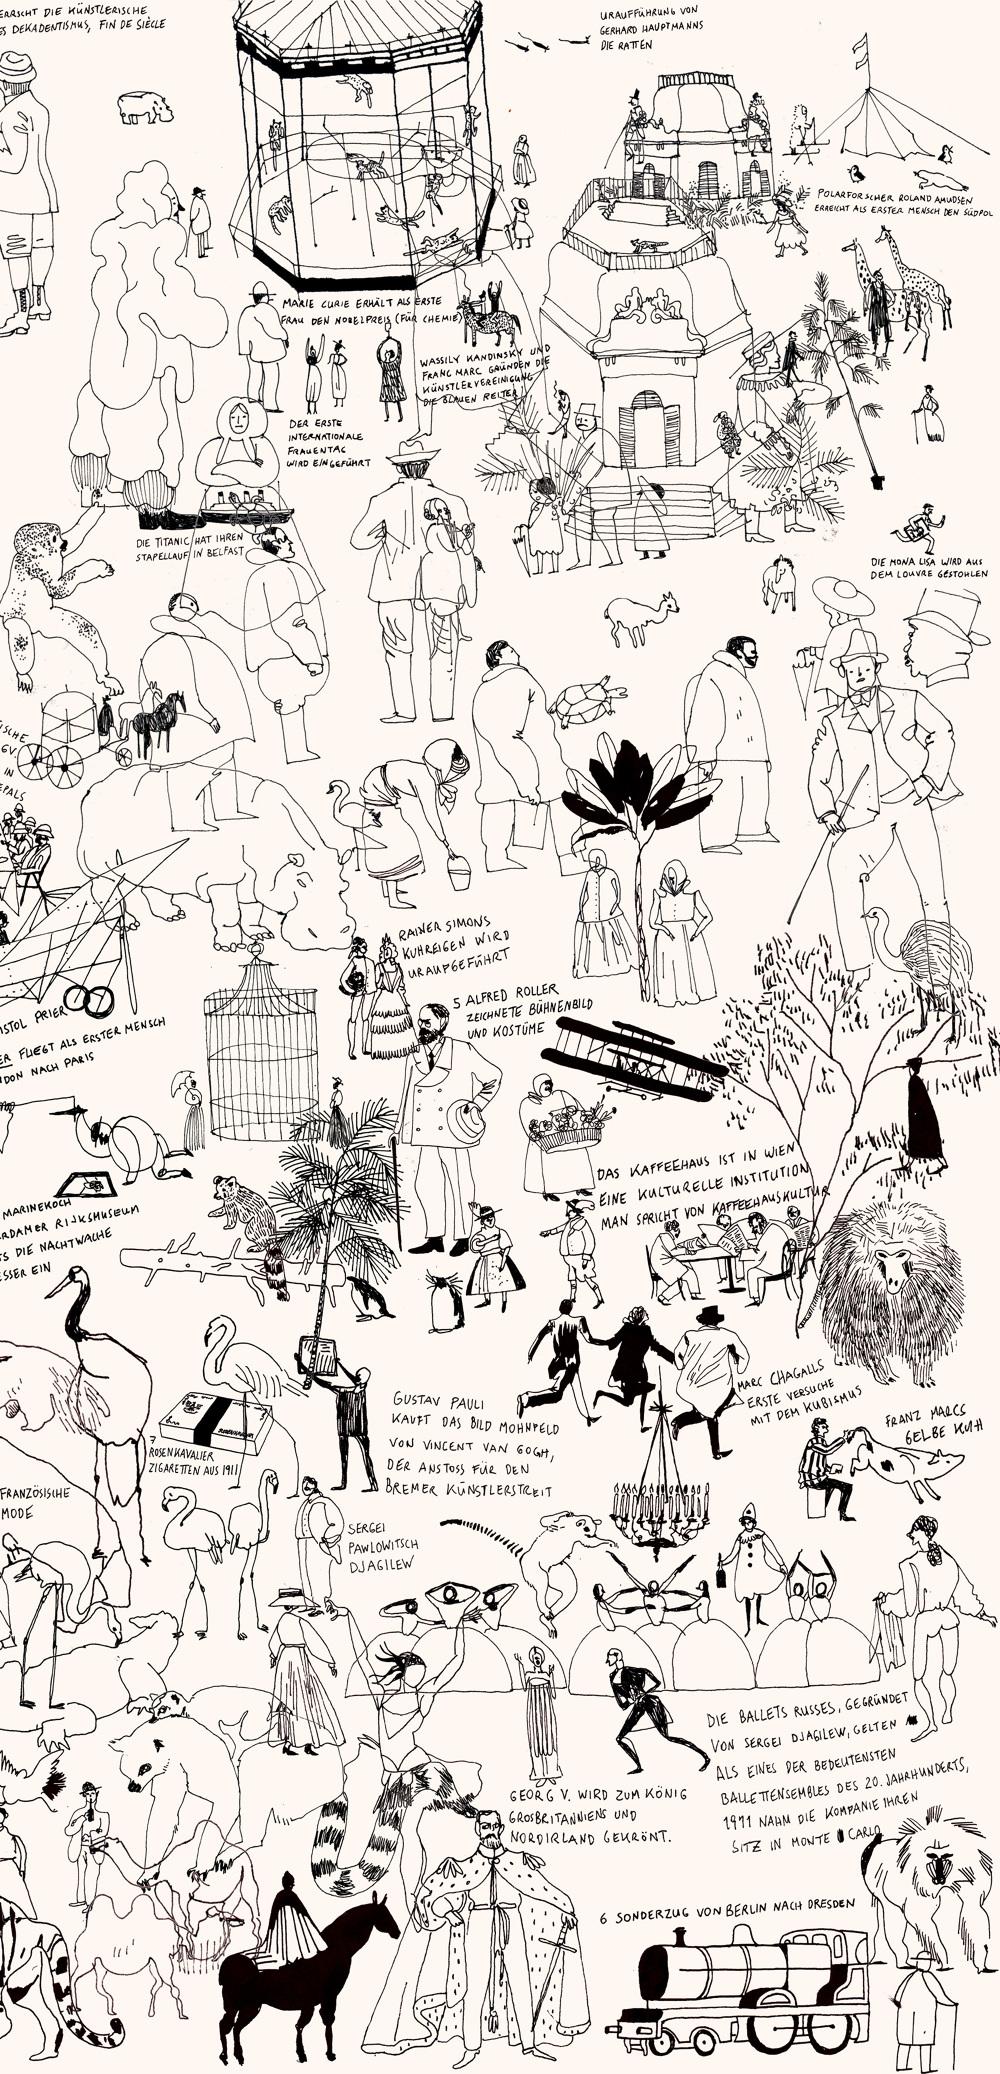 任刚 分享 创业插图 平面广告 lauraedel bacher @ rengang (9)